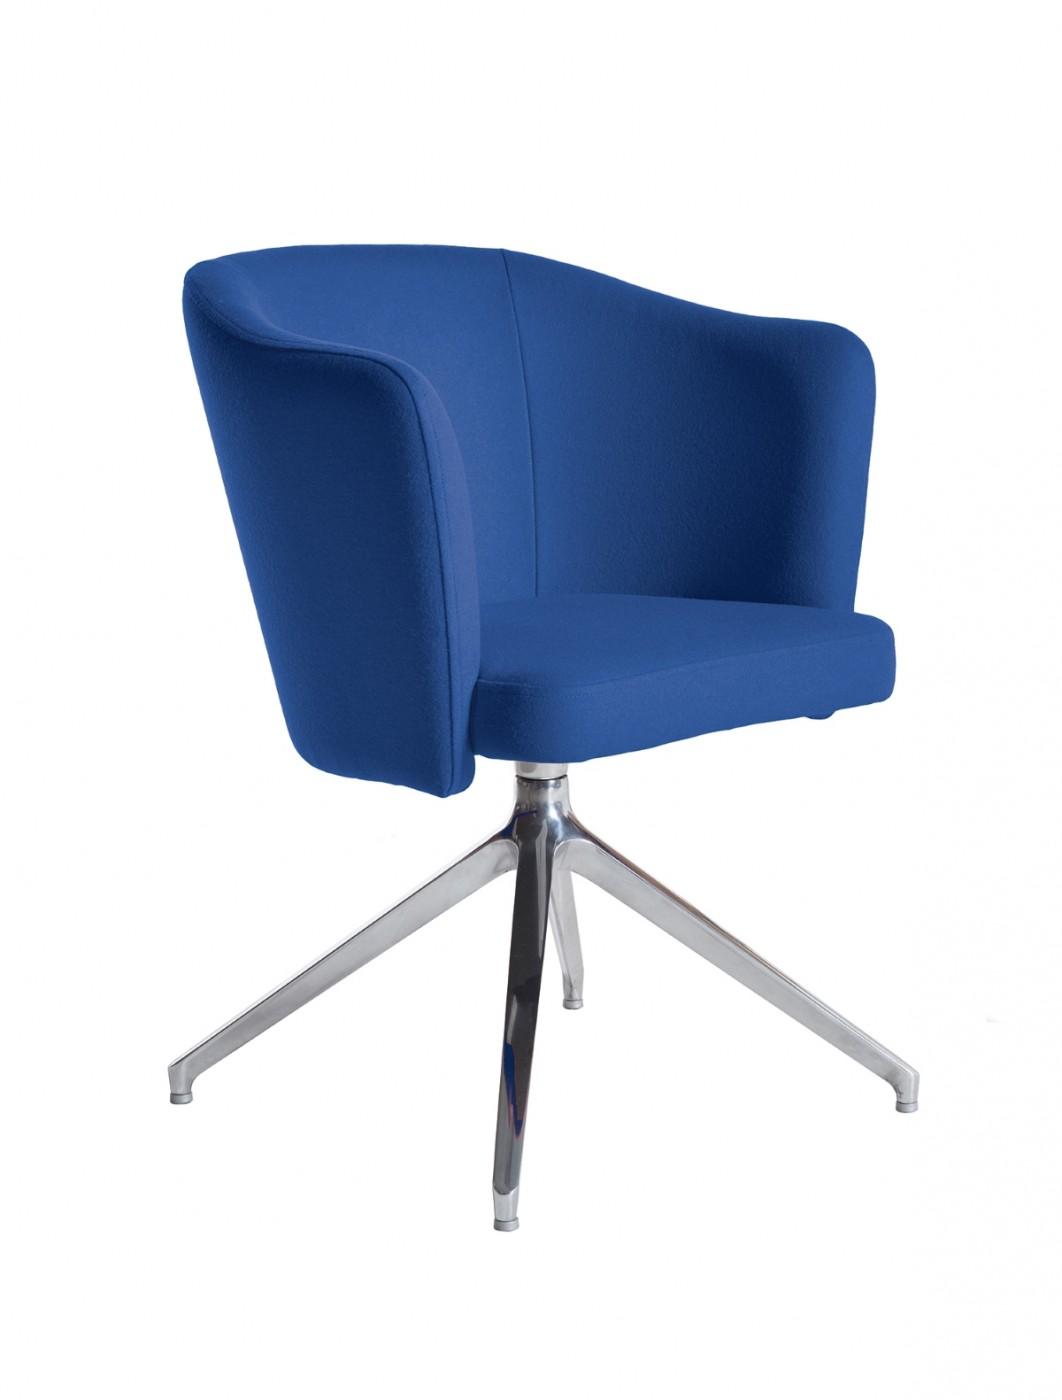 Soft Seating - Dams Otis Single Seater Tub Chair OTIS01 | 121 Office ...